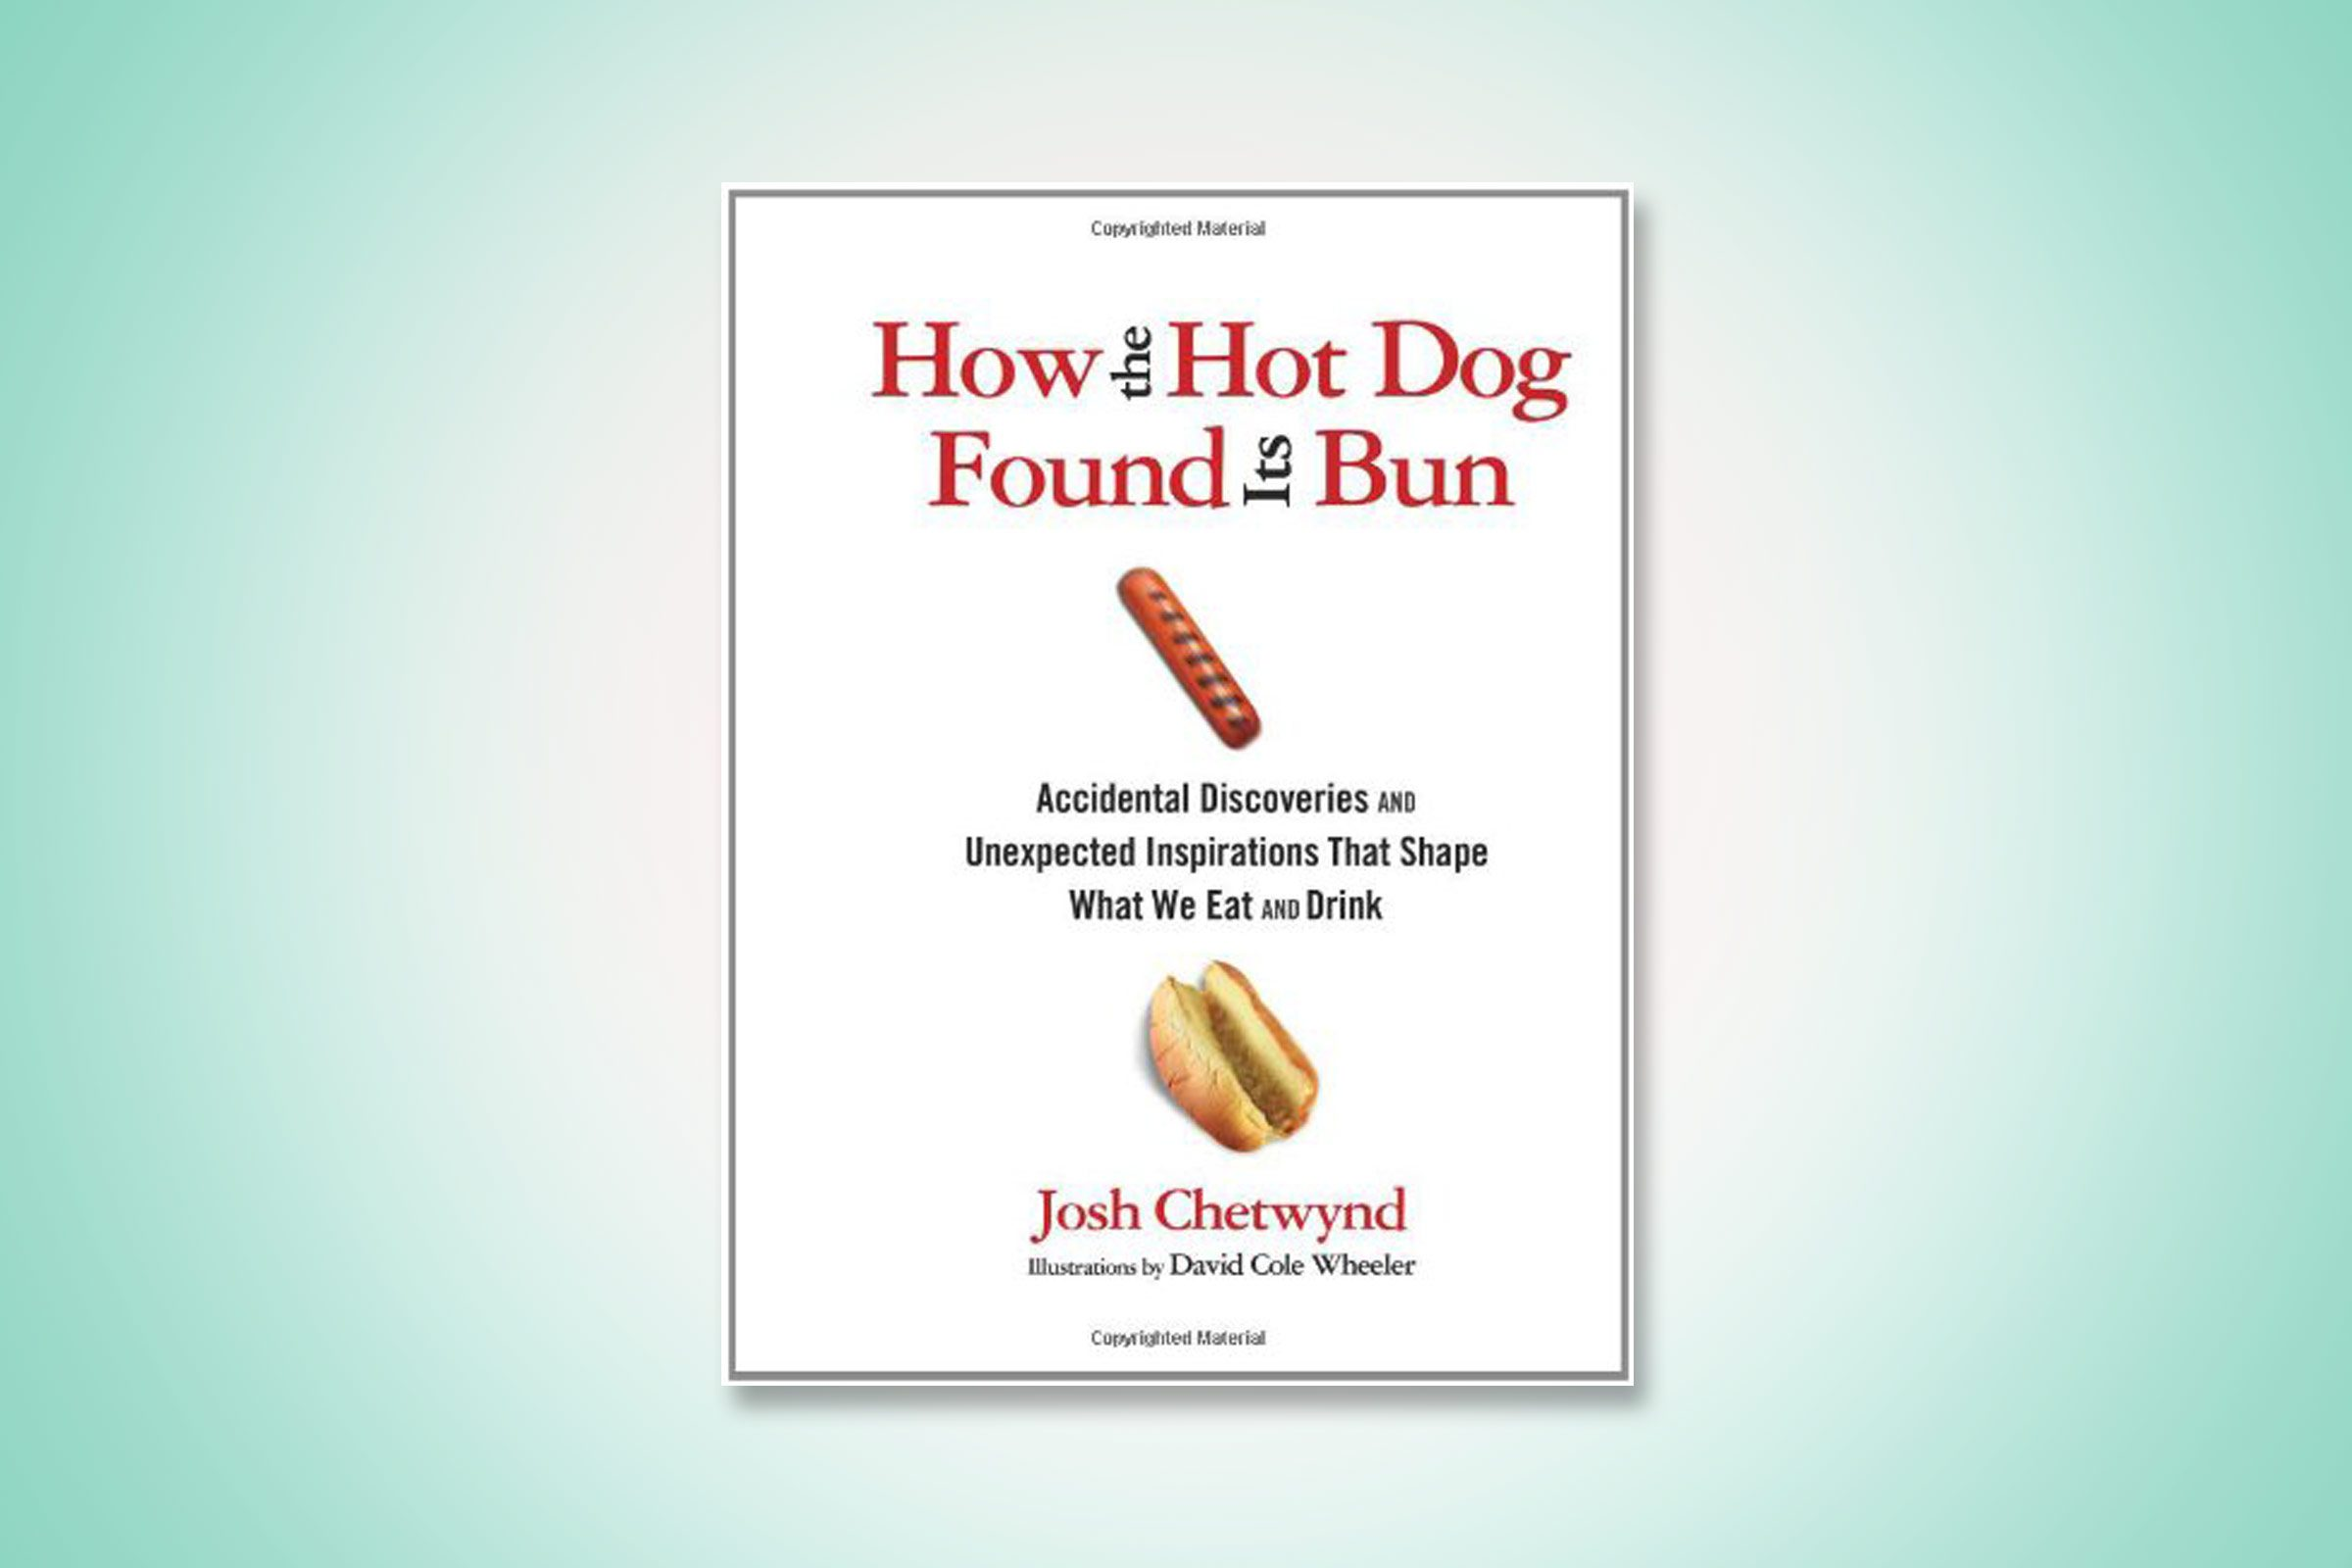 More fascinating food tales